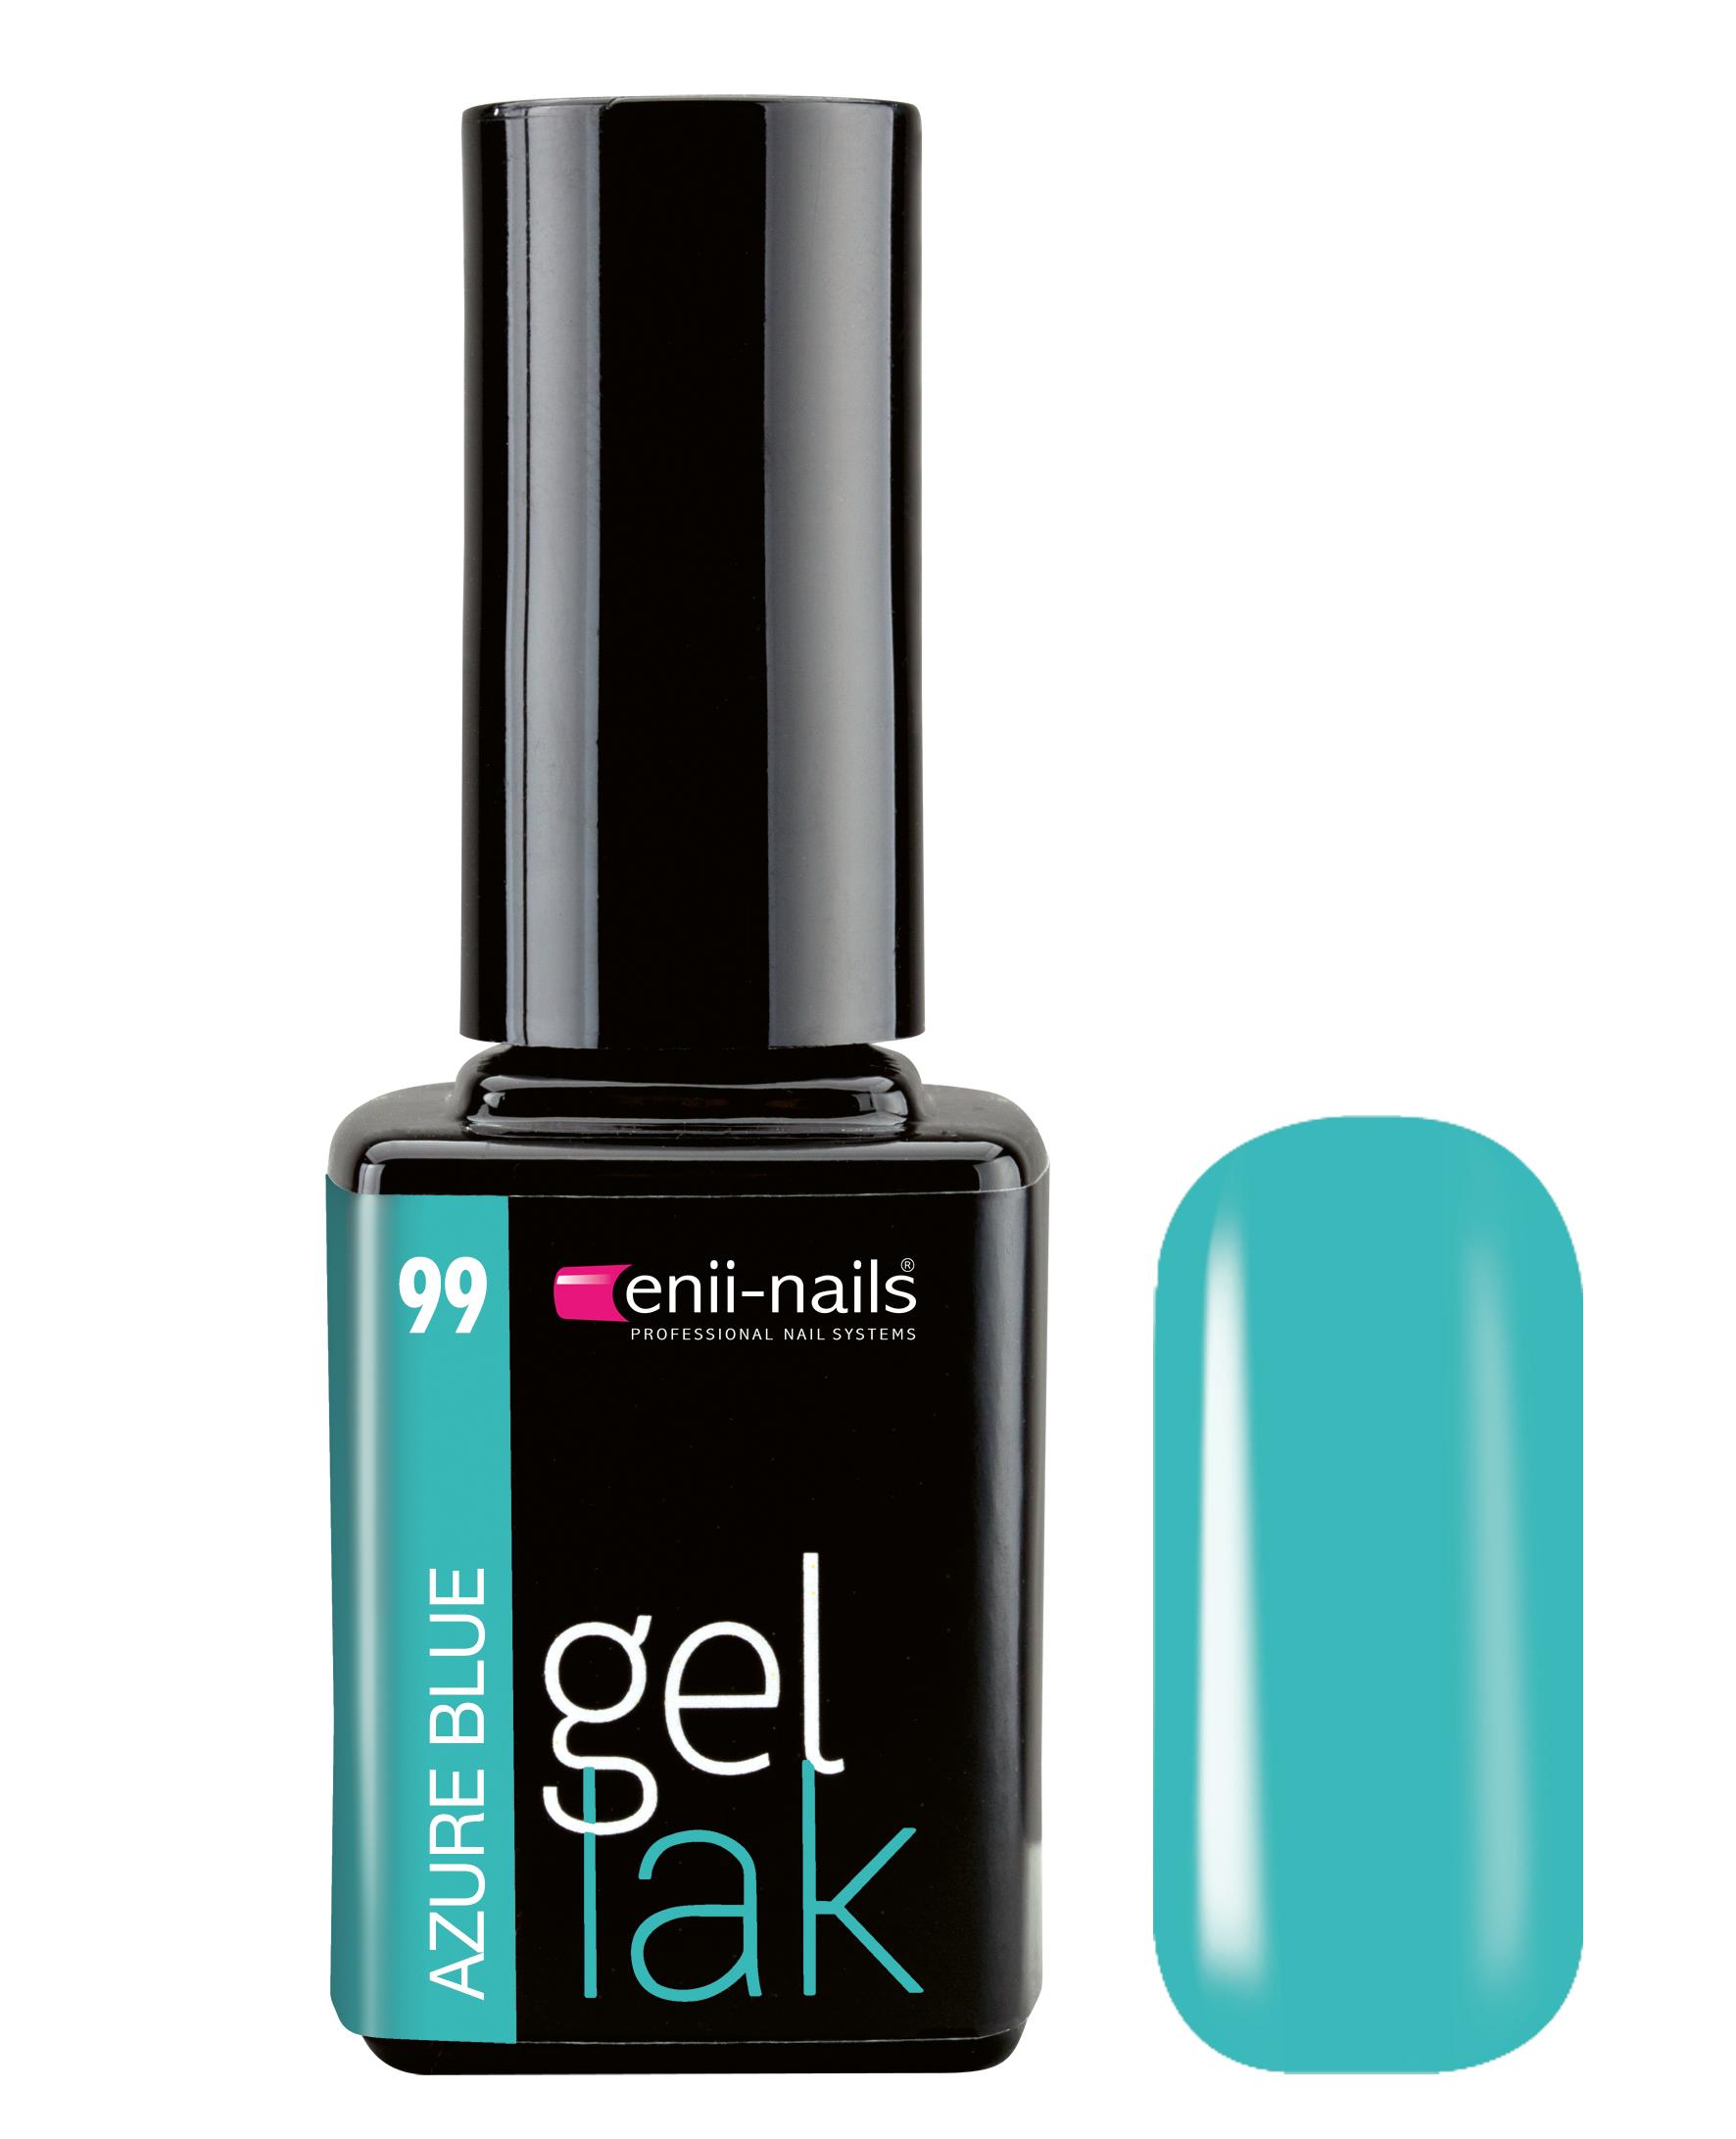 ENII-NAILS Gel lak 11 ml -  Azure Blue